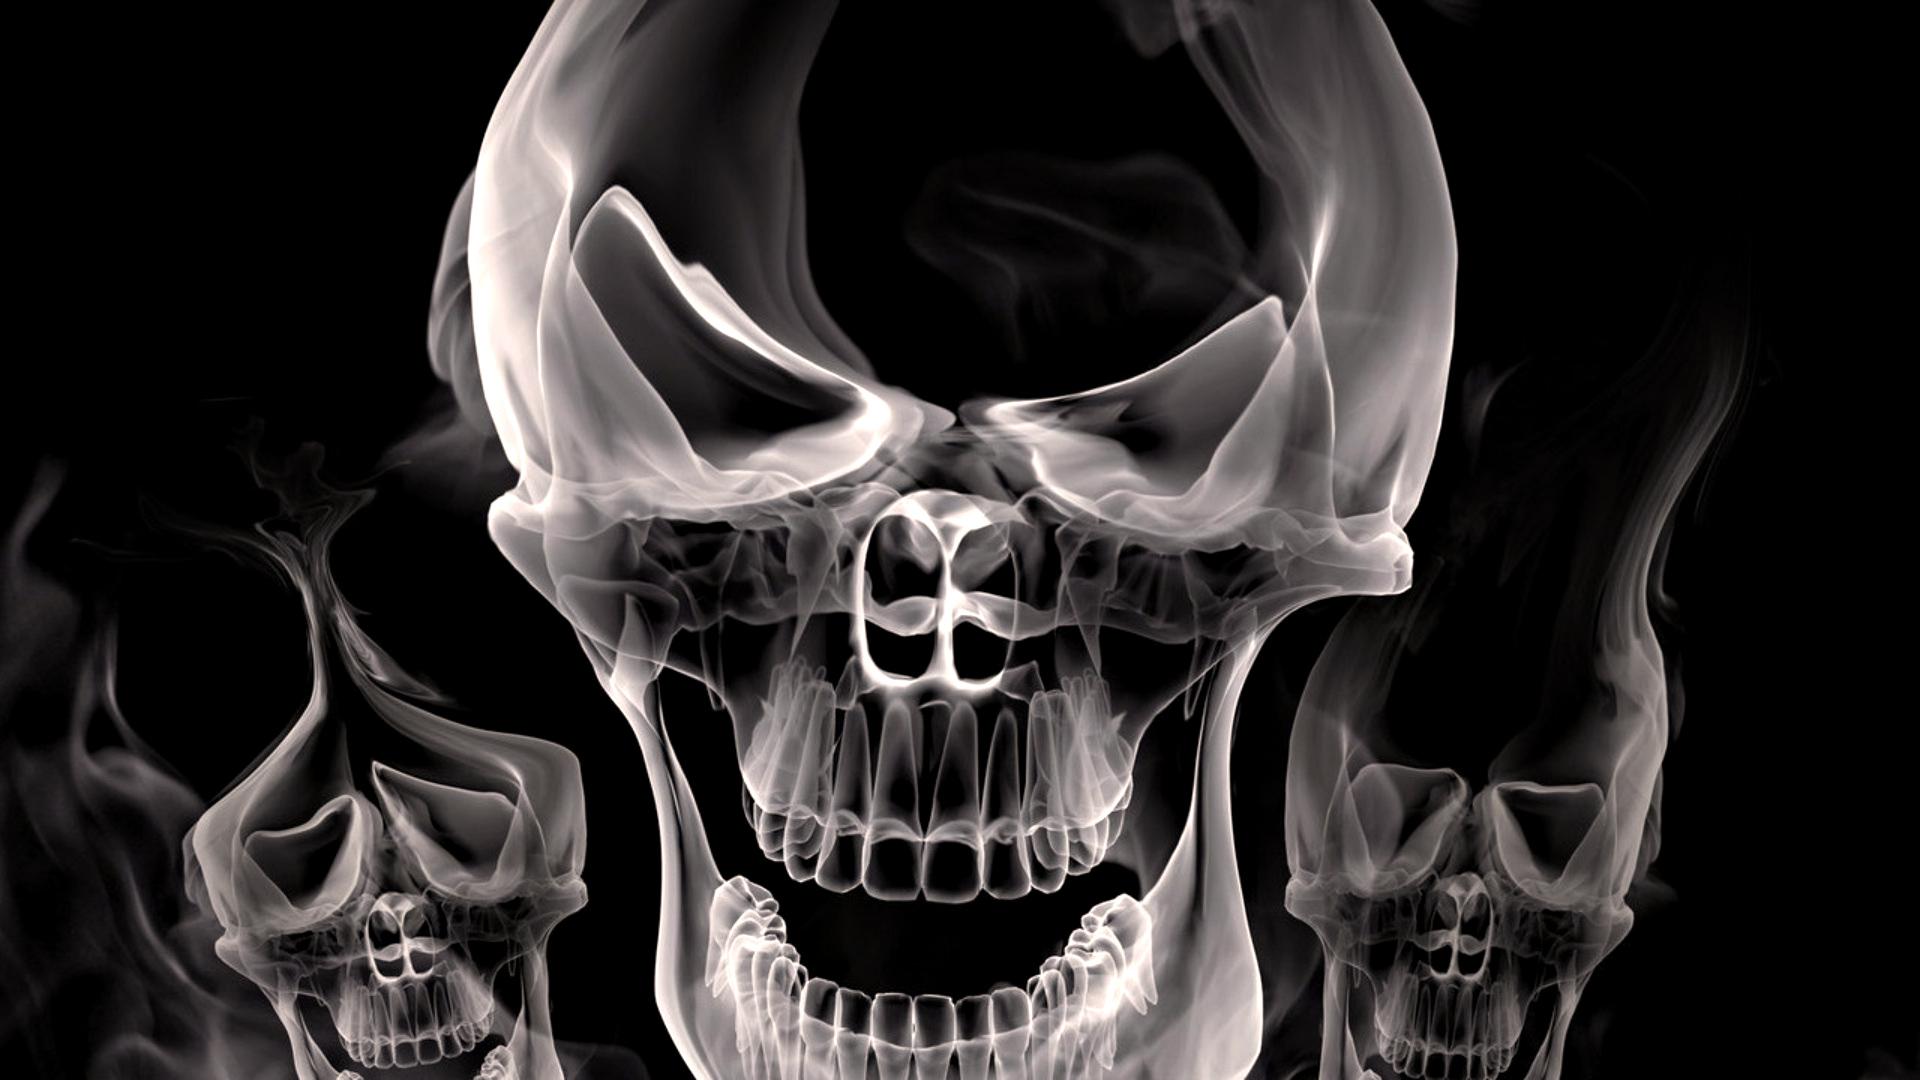 Cool 3d skull smoke hd wallpaper voltagebd Choice Image